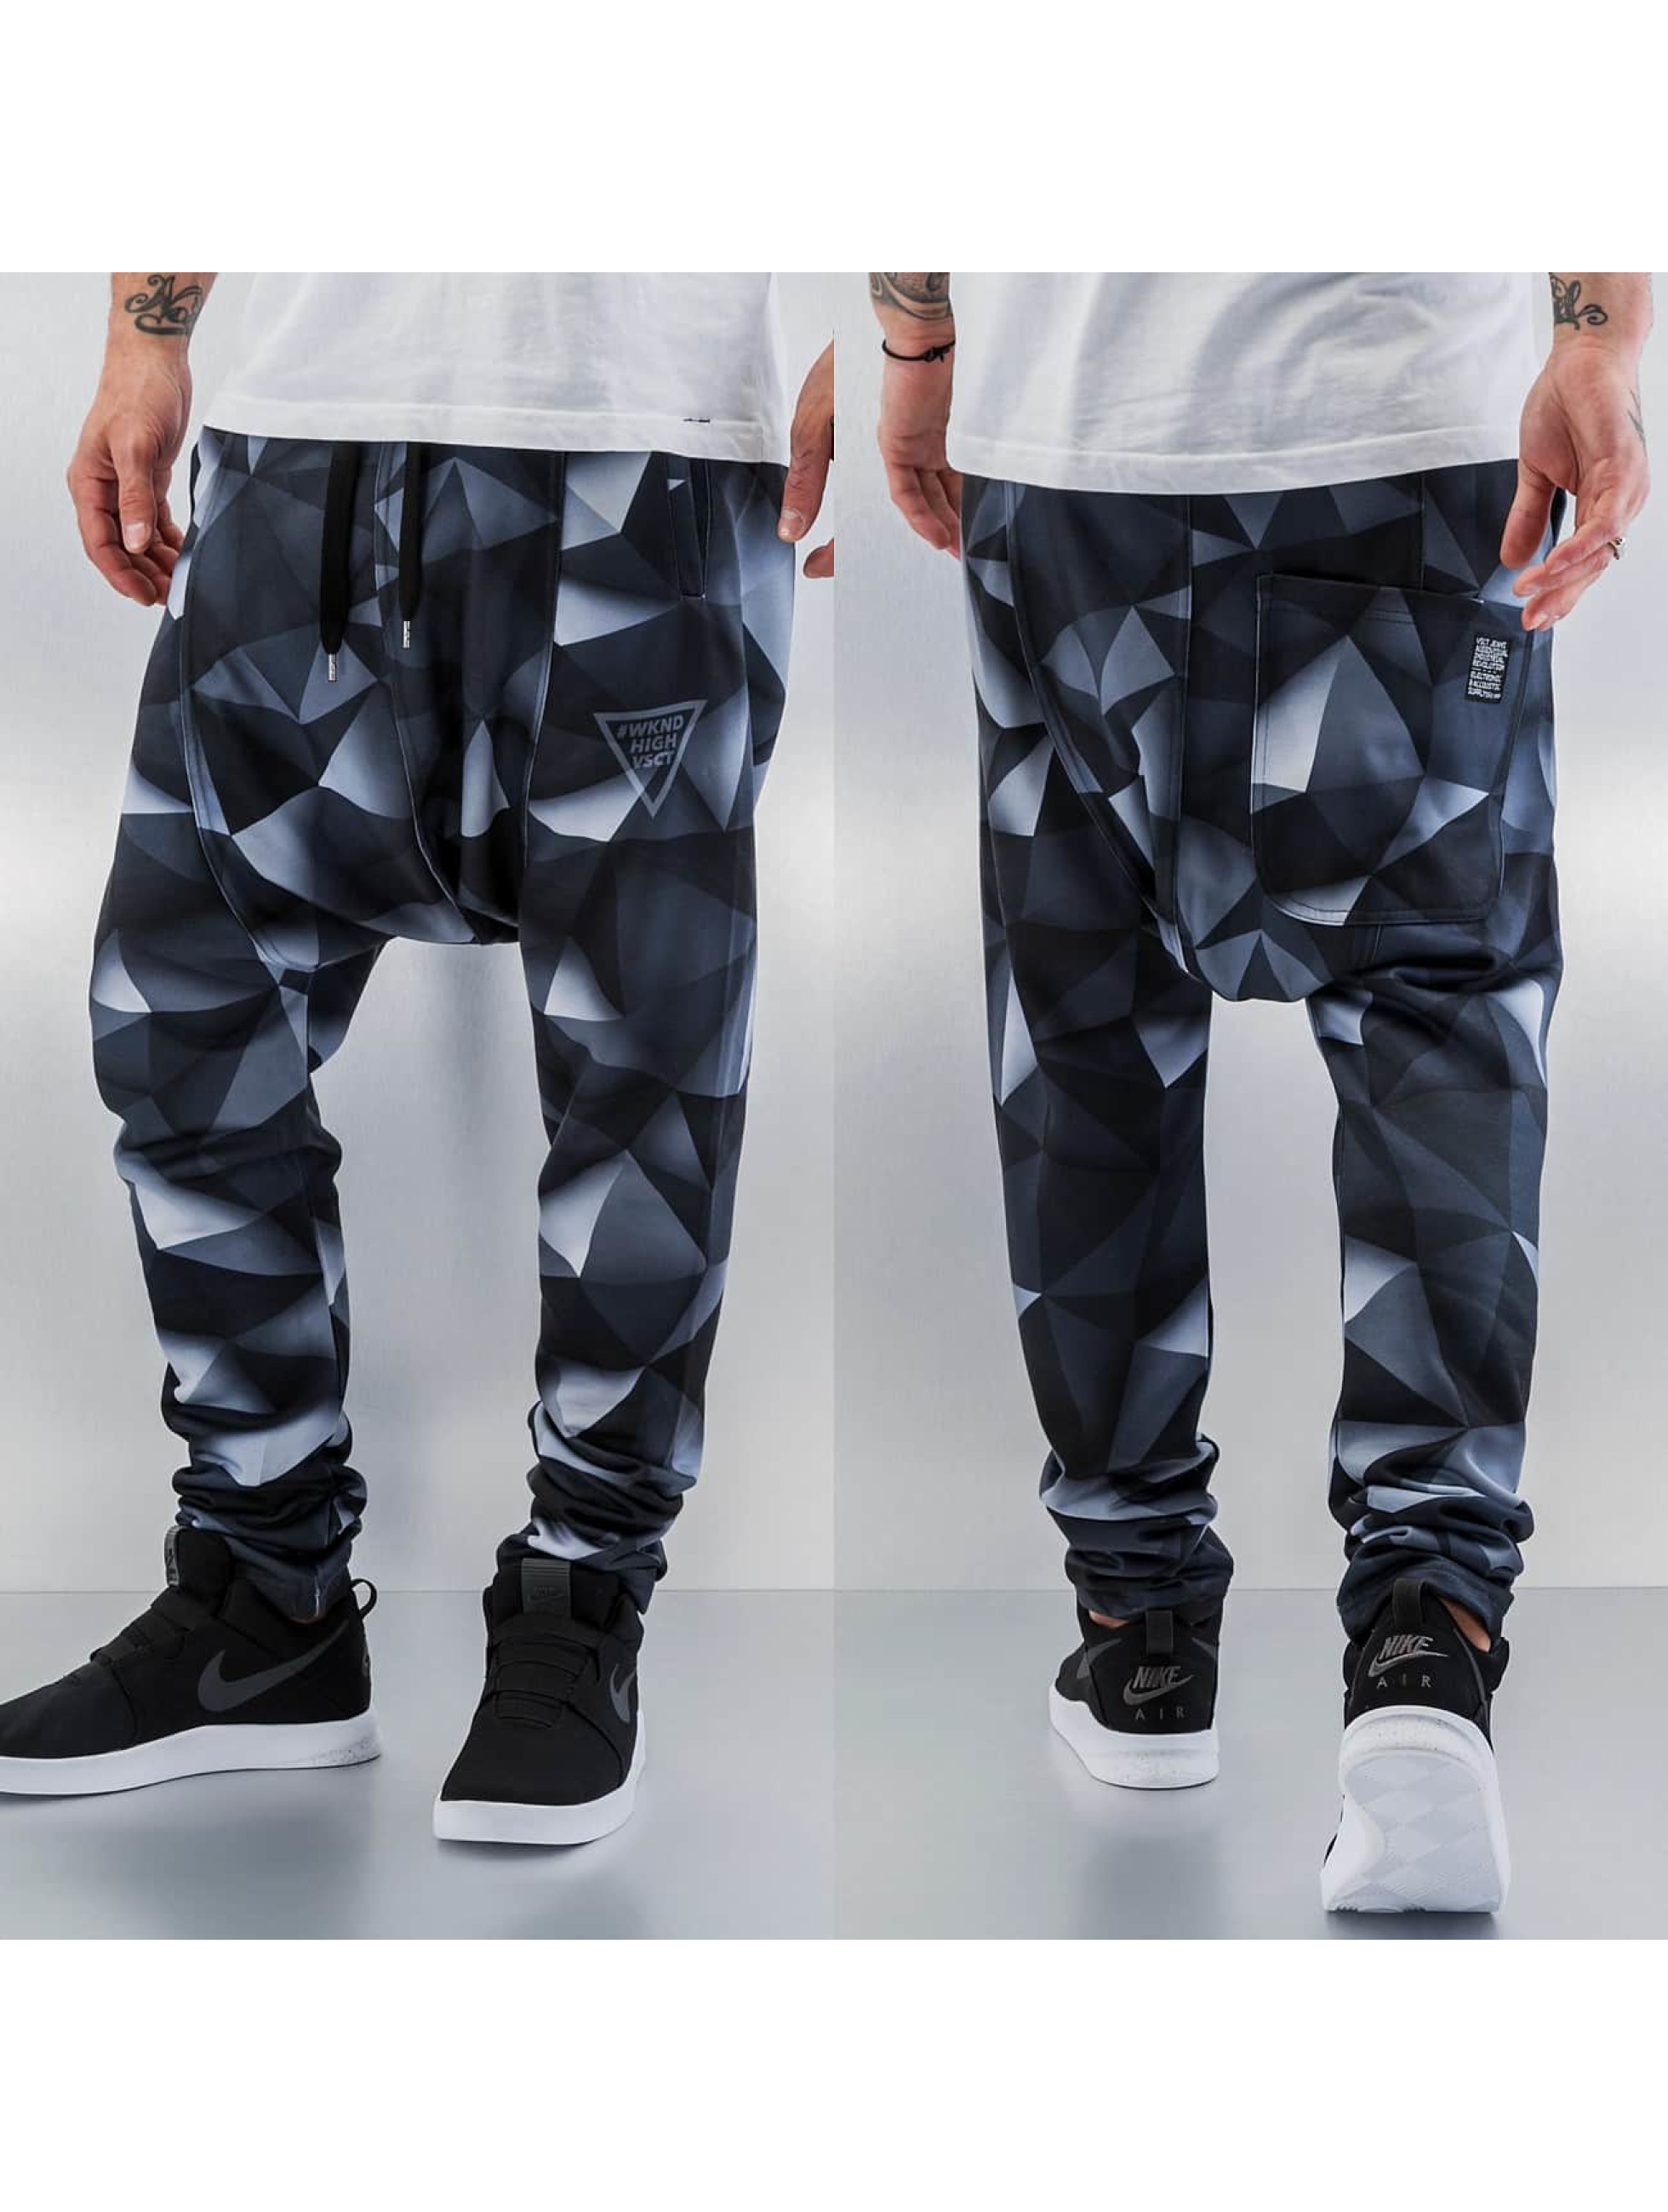 VSCT Clubwear joggingbroek 3-D Black Geomatrix zwart